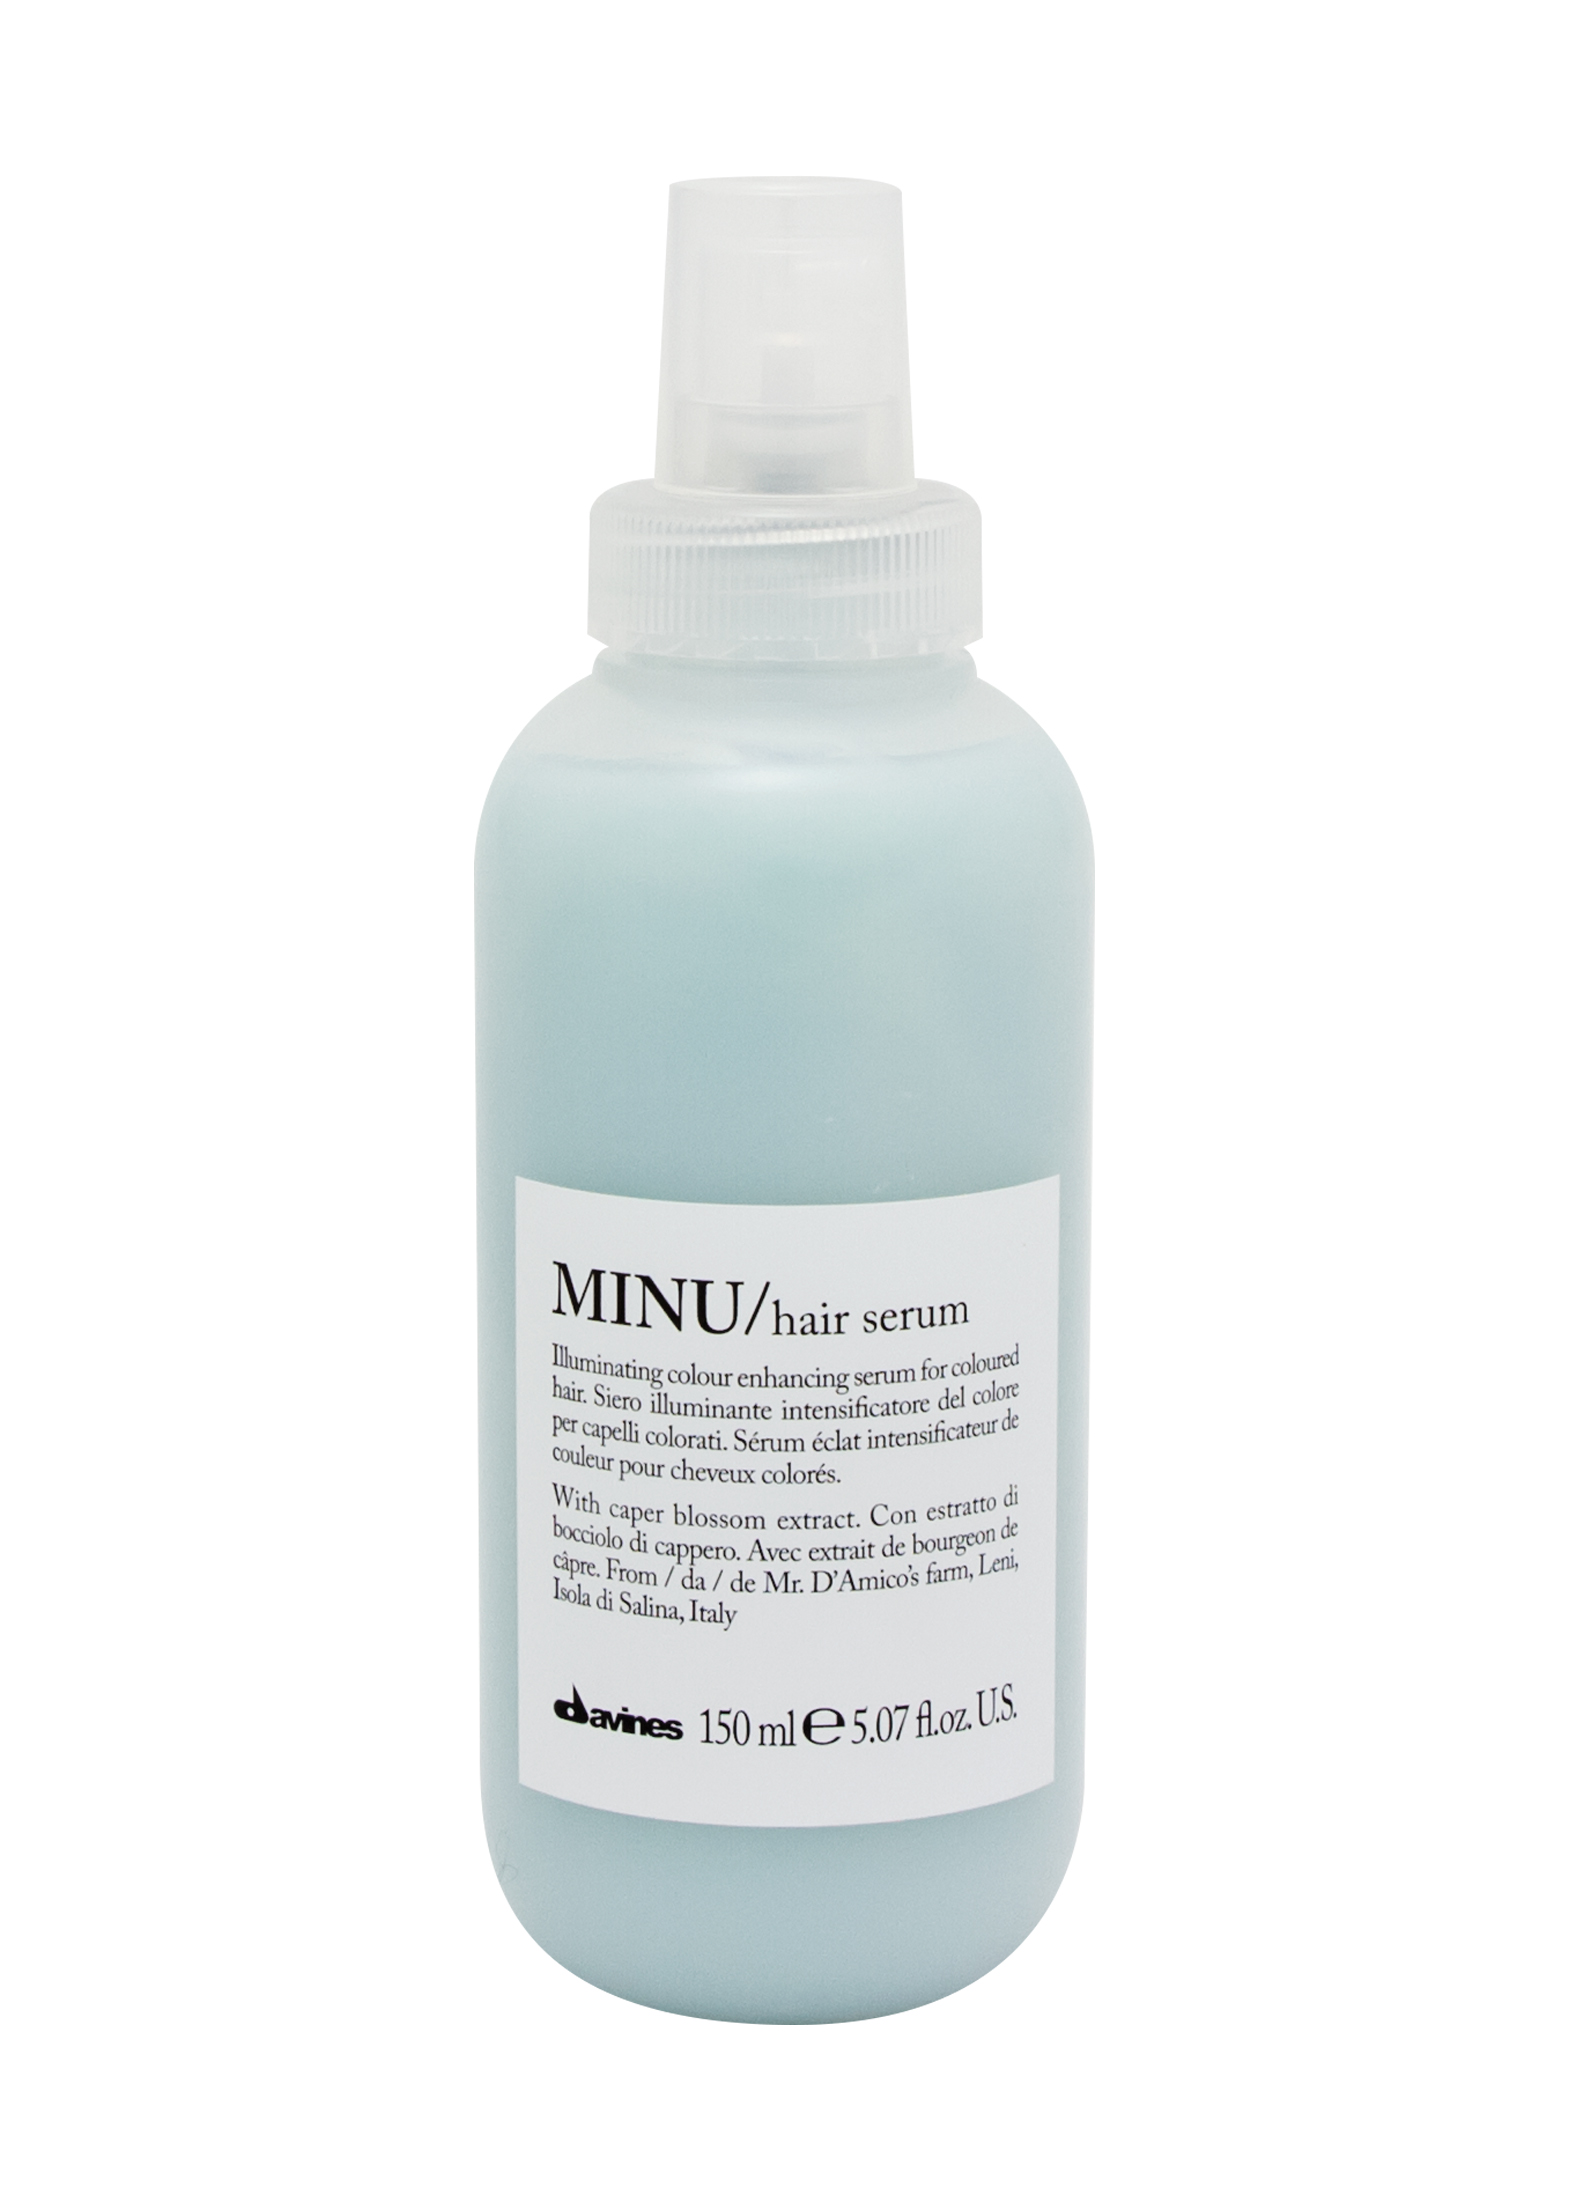 DEHC MINU Hair Serum 150ml image number 0